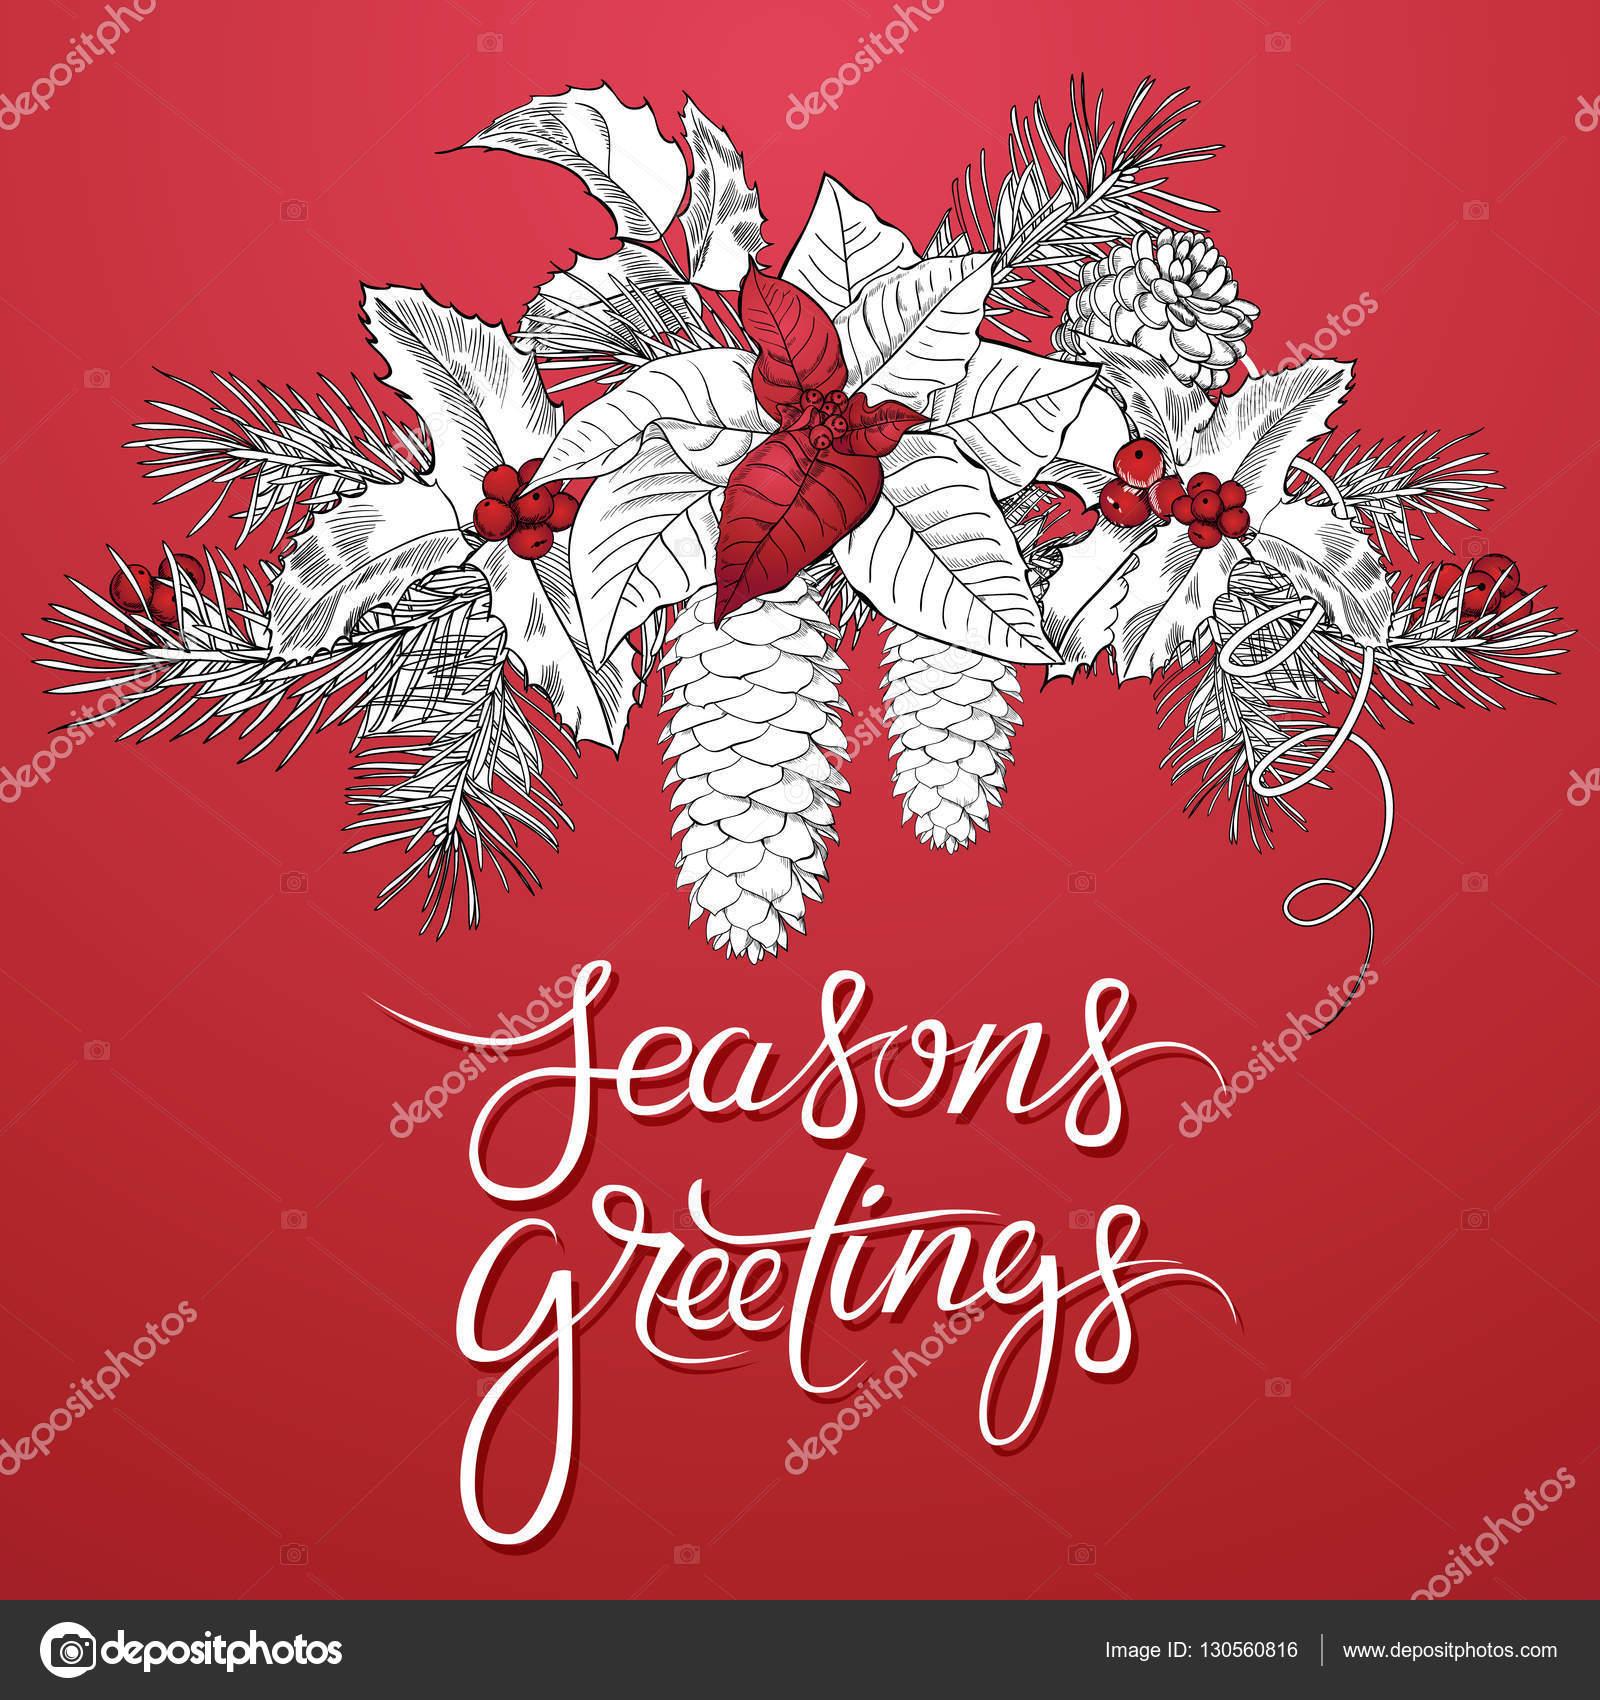 Seasons greetings background stock vector 4airar 130560816 seasons greetings background stock vector m4hsunfo